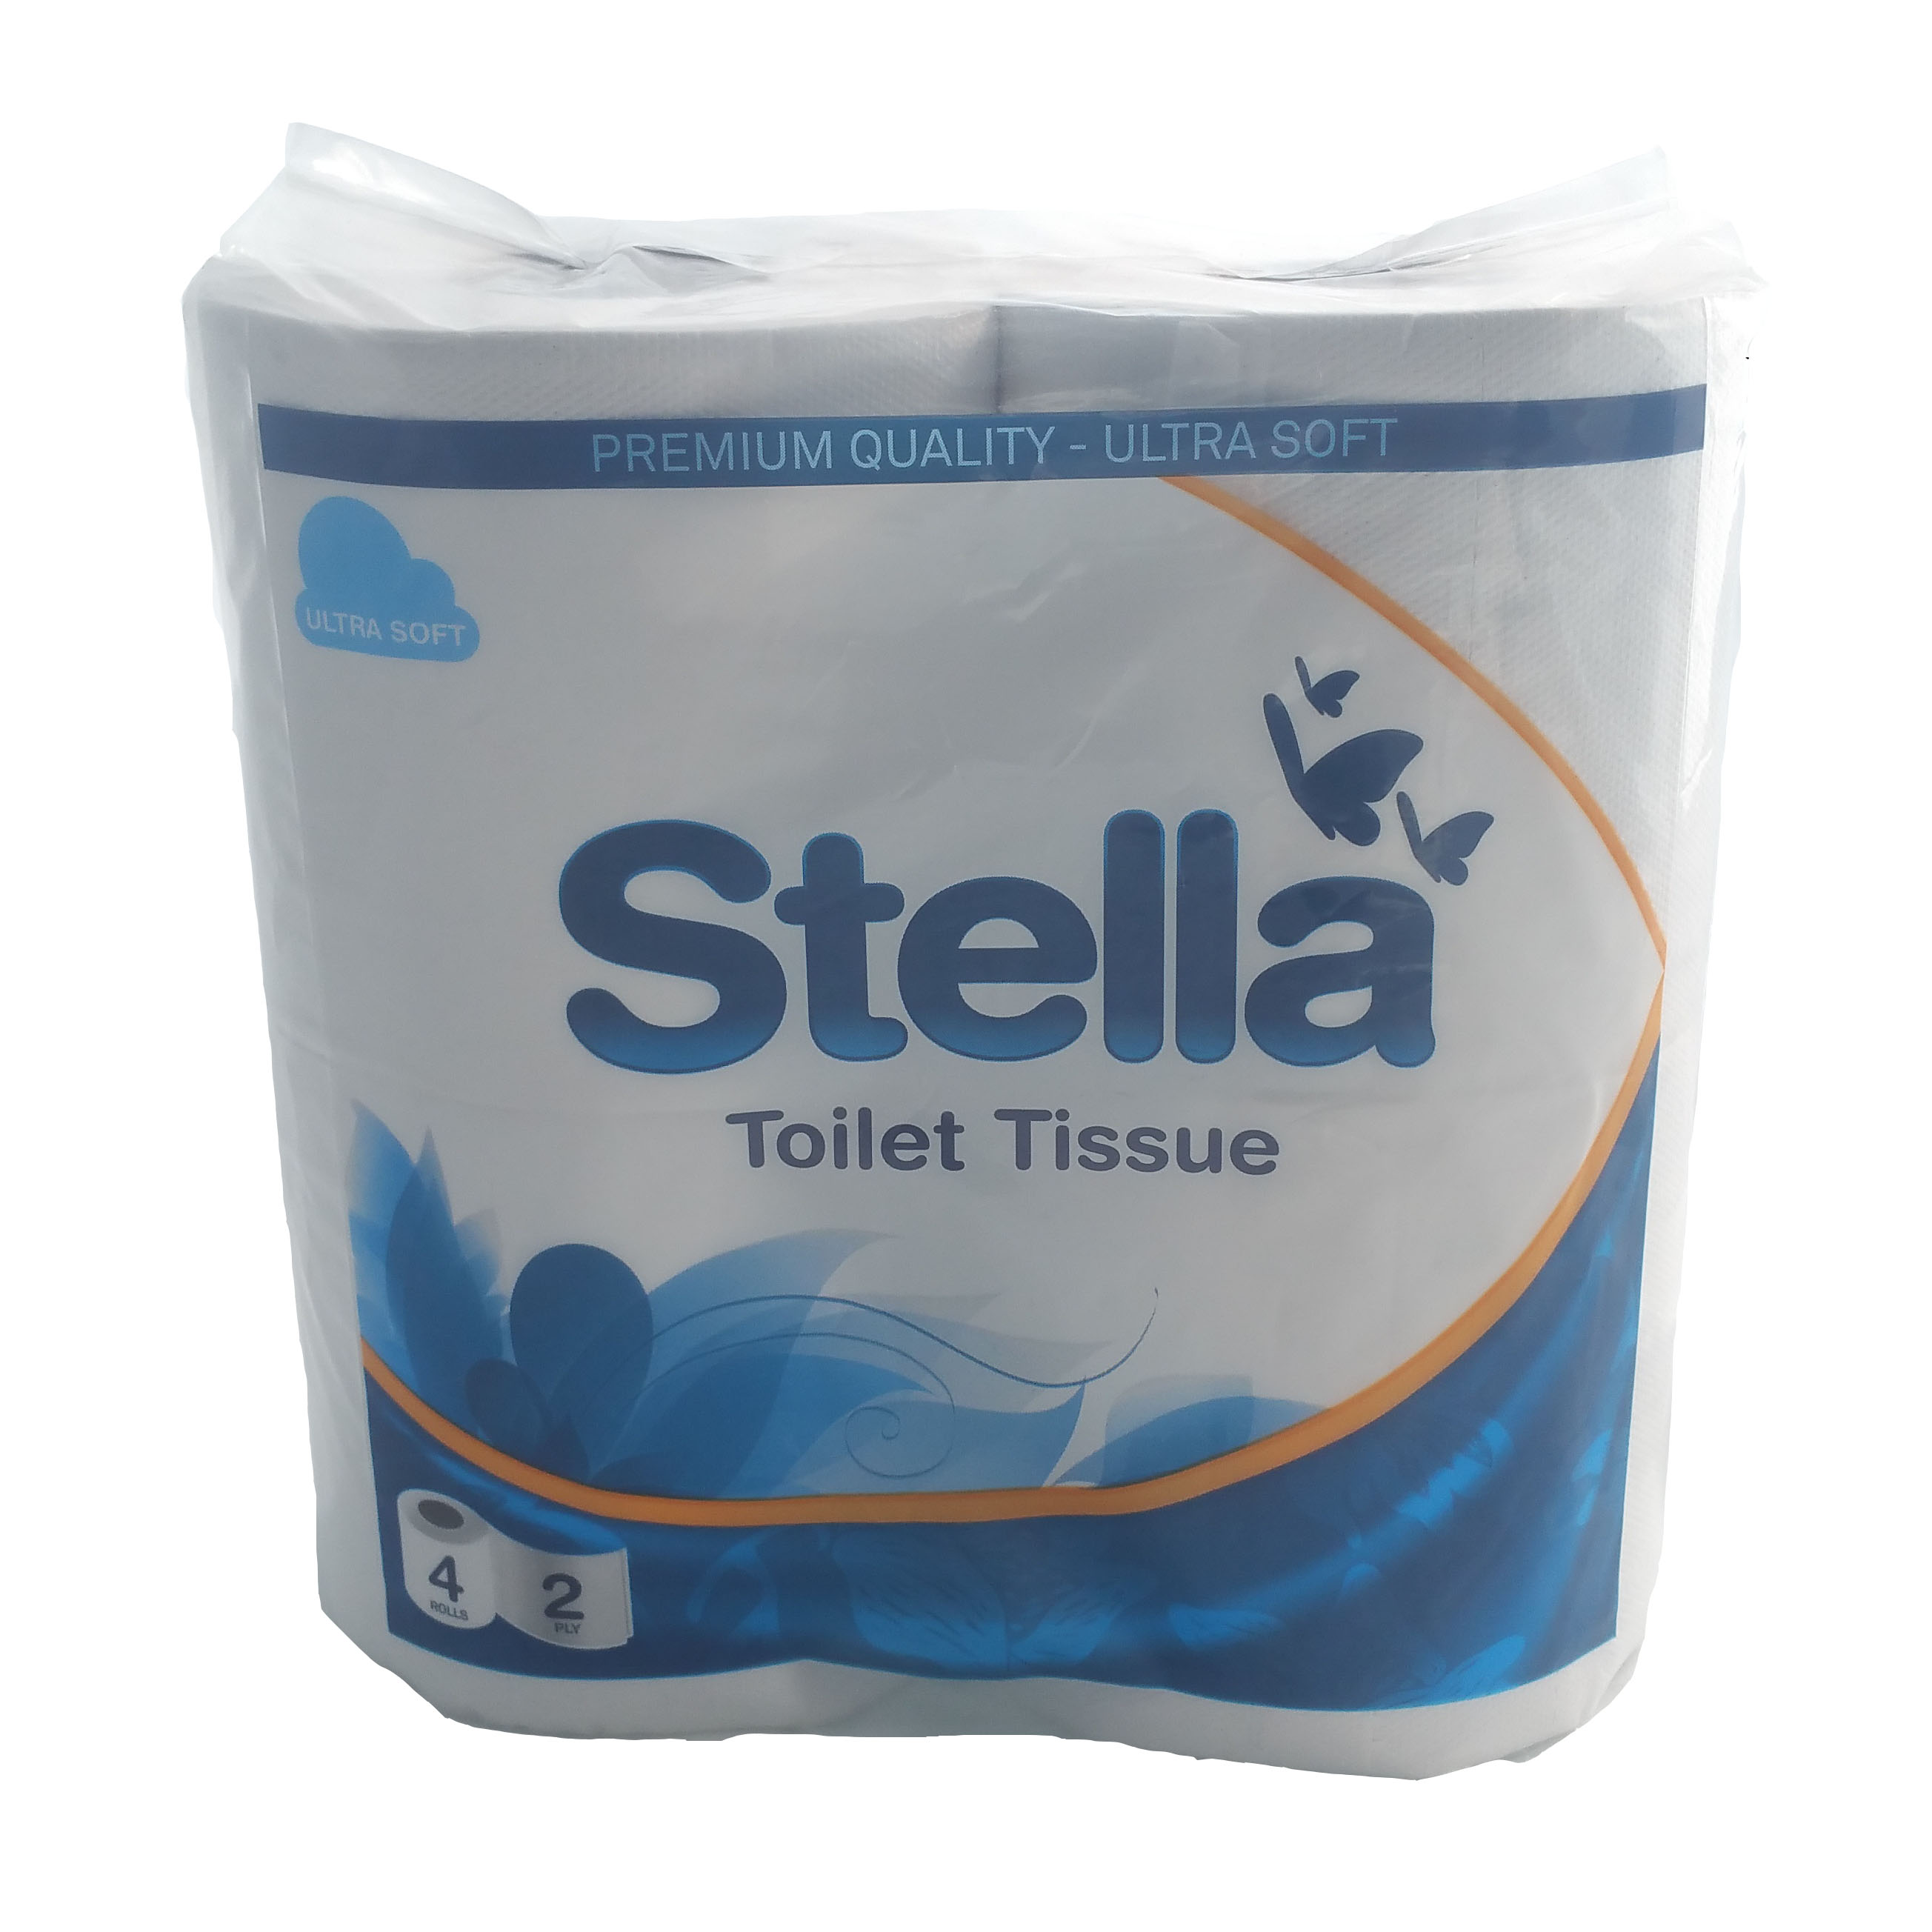 Toilet Paper Whisper 250 Sheet 2ply(48) - Janitor Supplies Brisbane